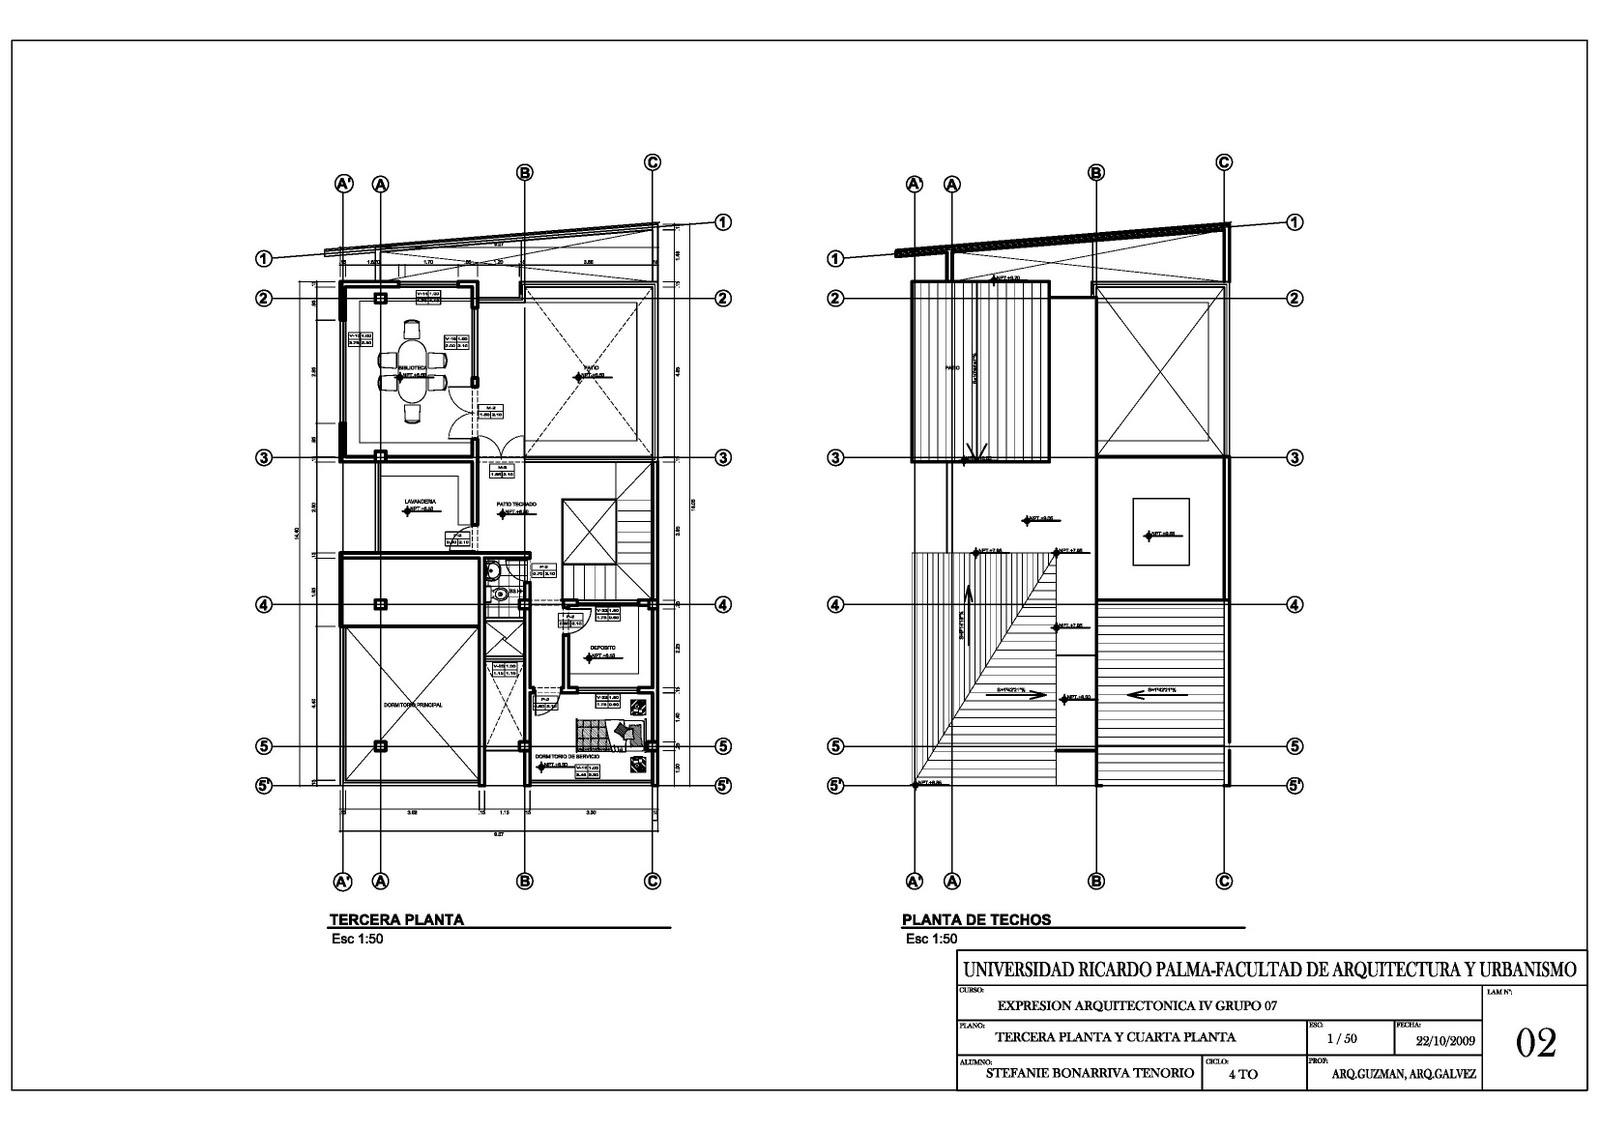 Planos de arquitectura for Arquitectura planos y disenos